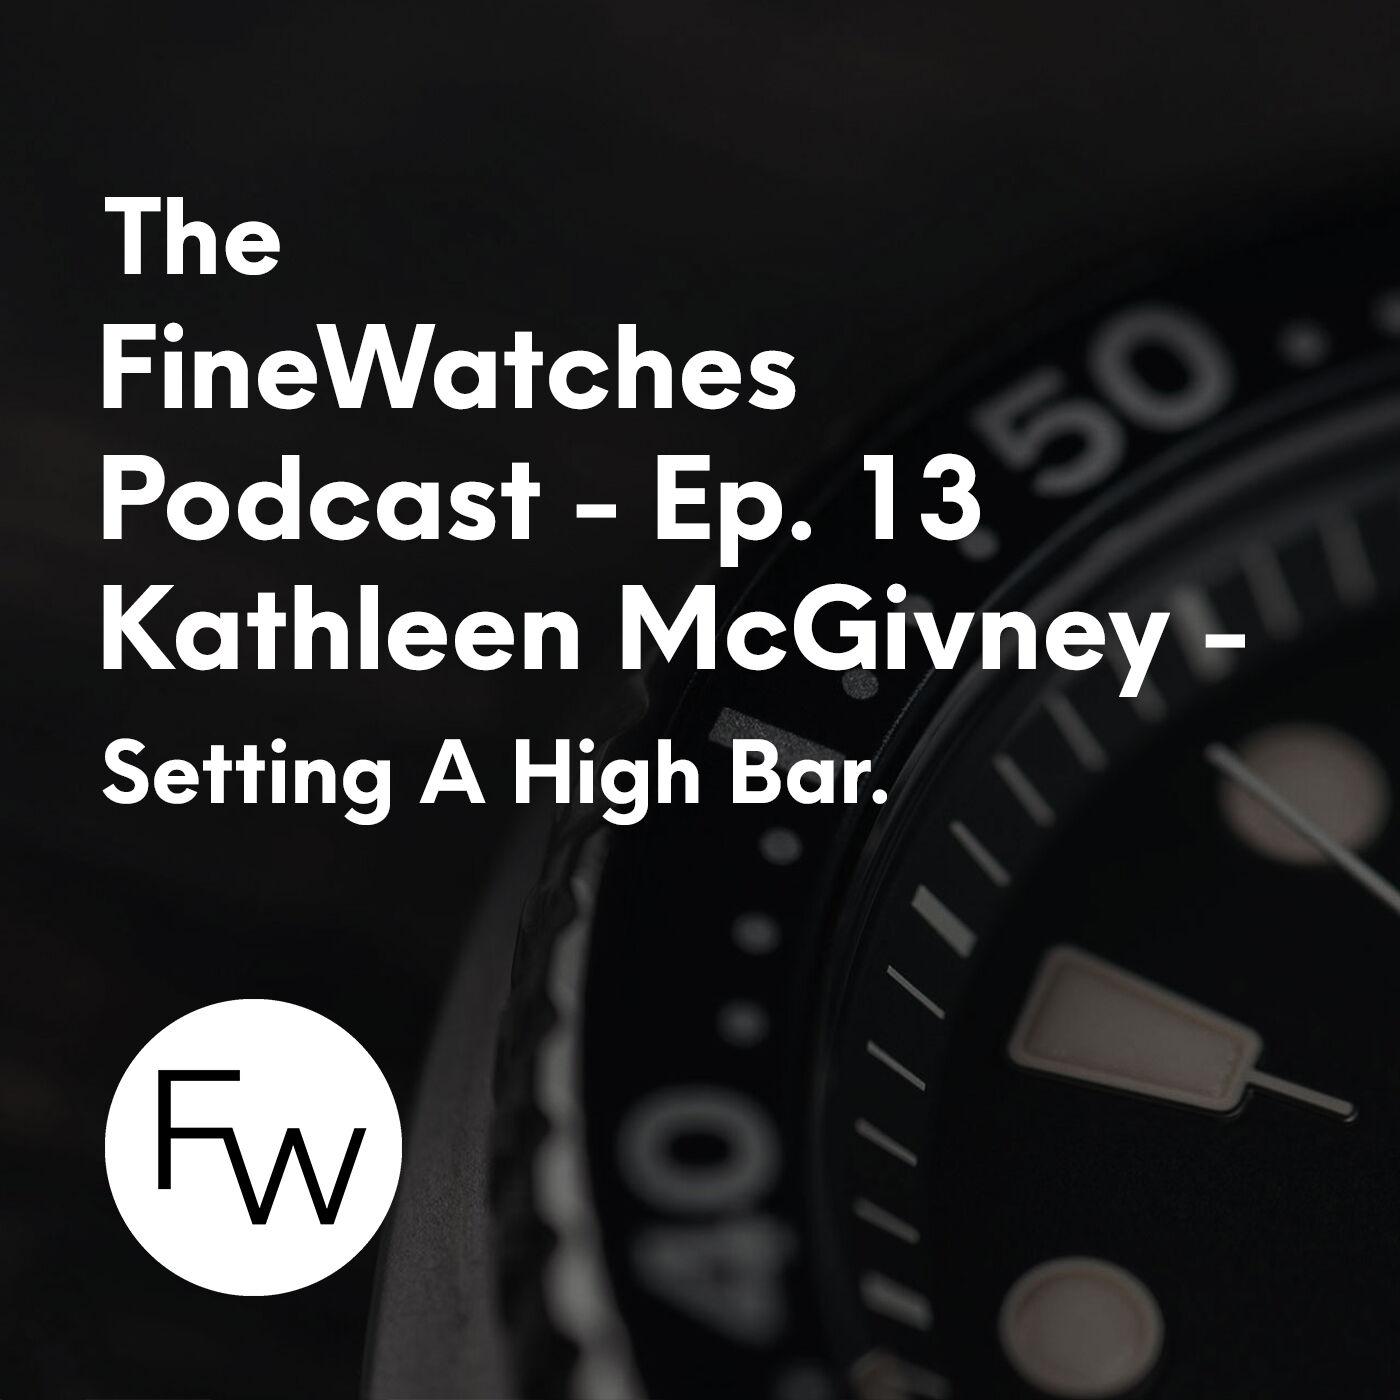 Setting A High Bar - Kathleen McGivney